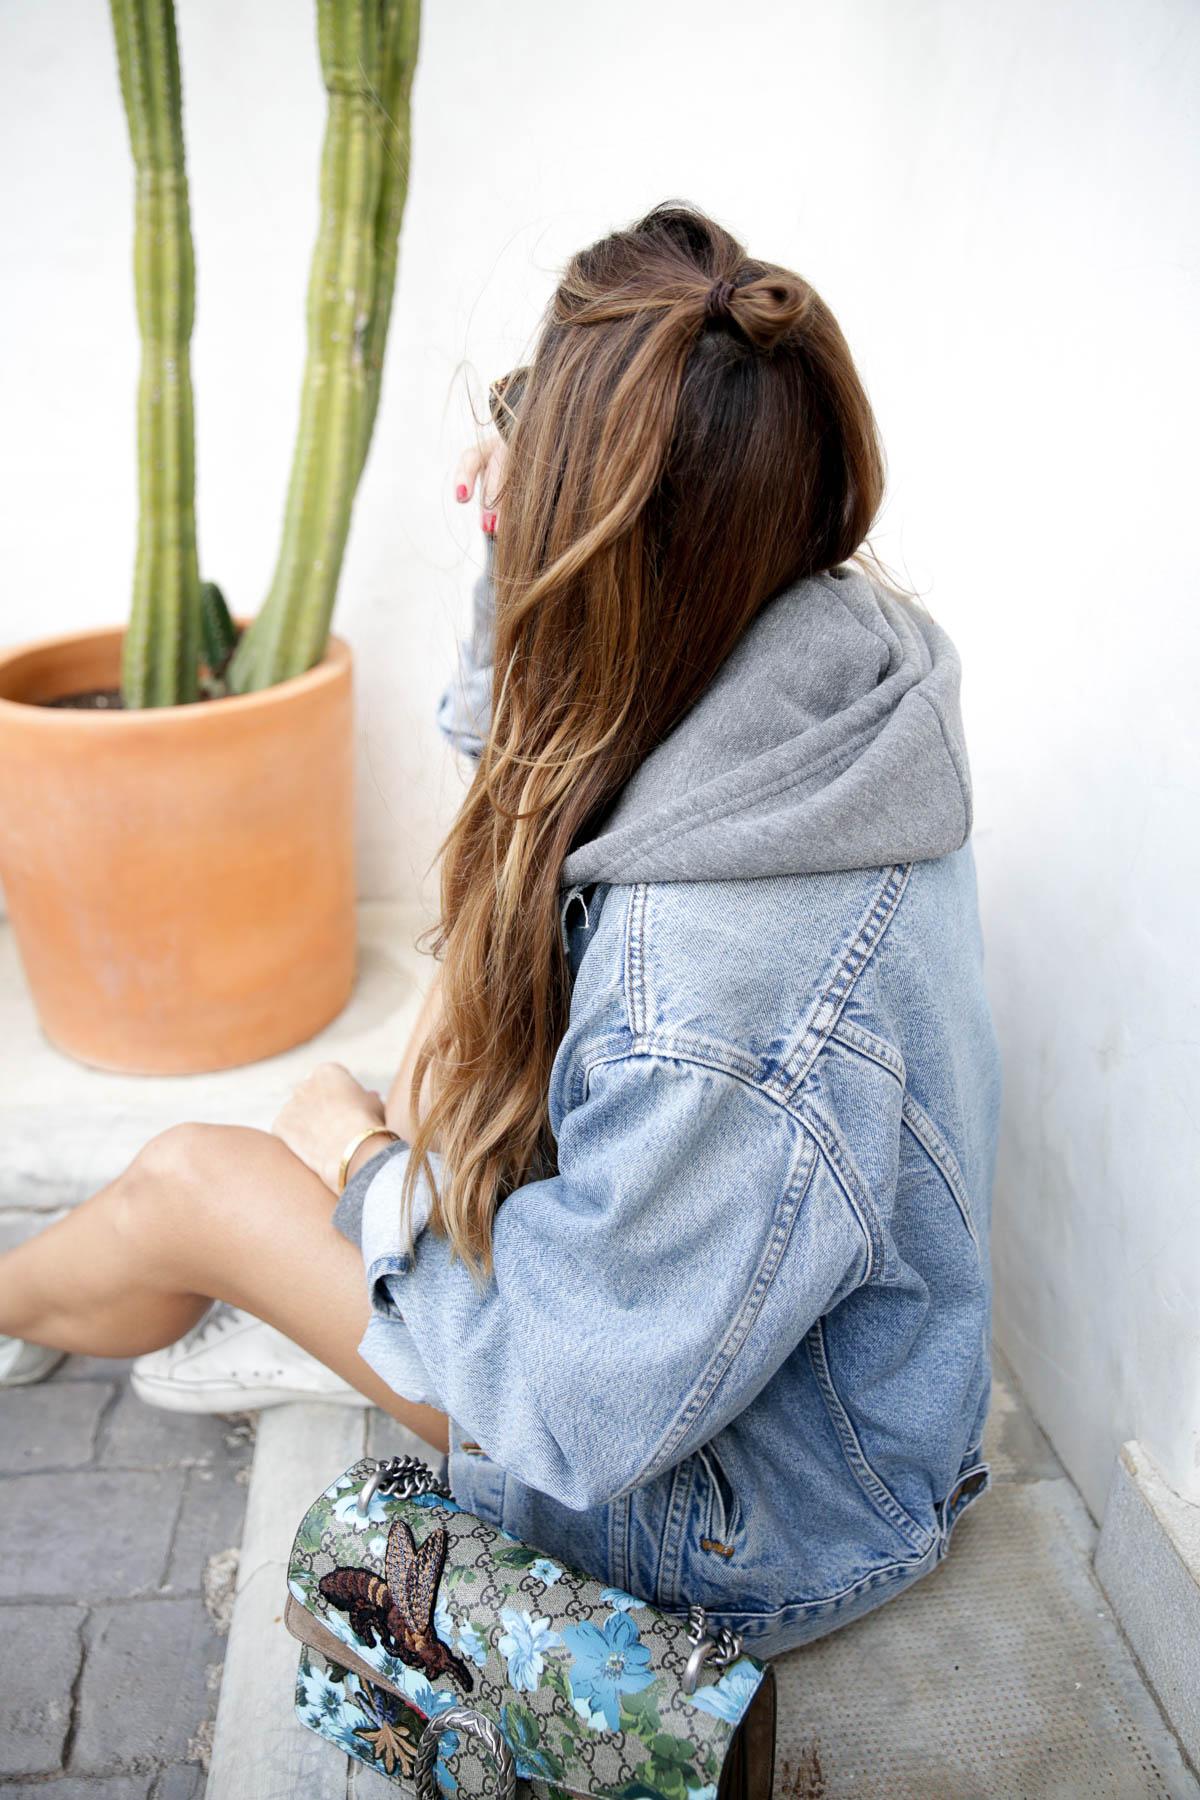 black-friday-a-bicyclette-sweatshirt-hoodie-all-star-leather-piel-cuero-celine-bag-bolso-mini-skirt-falda-streetstyle-look-bartabac-outfit-moda-blogger-30